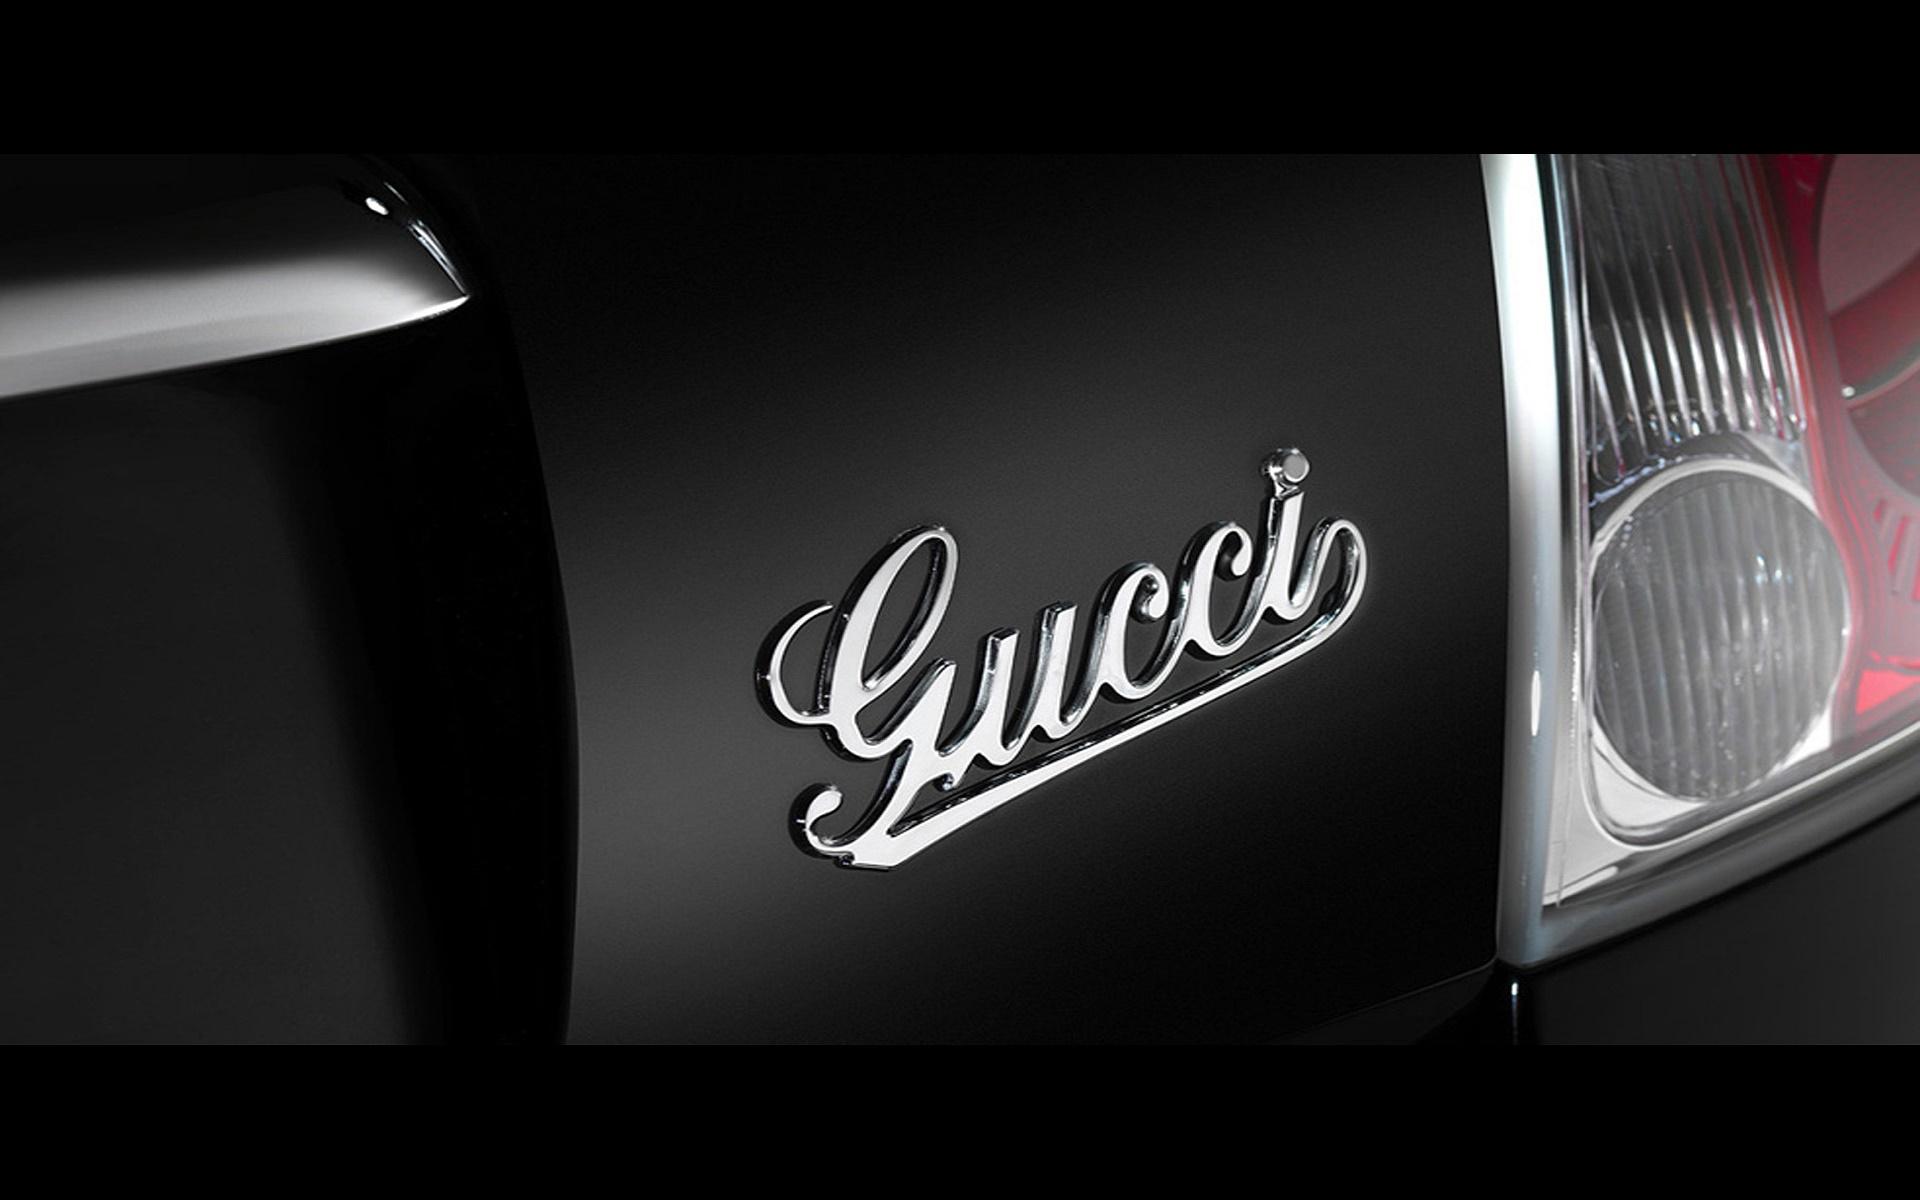 Gucci Wallpapers HD 1920x1200